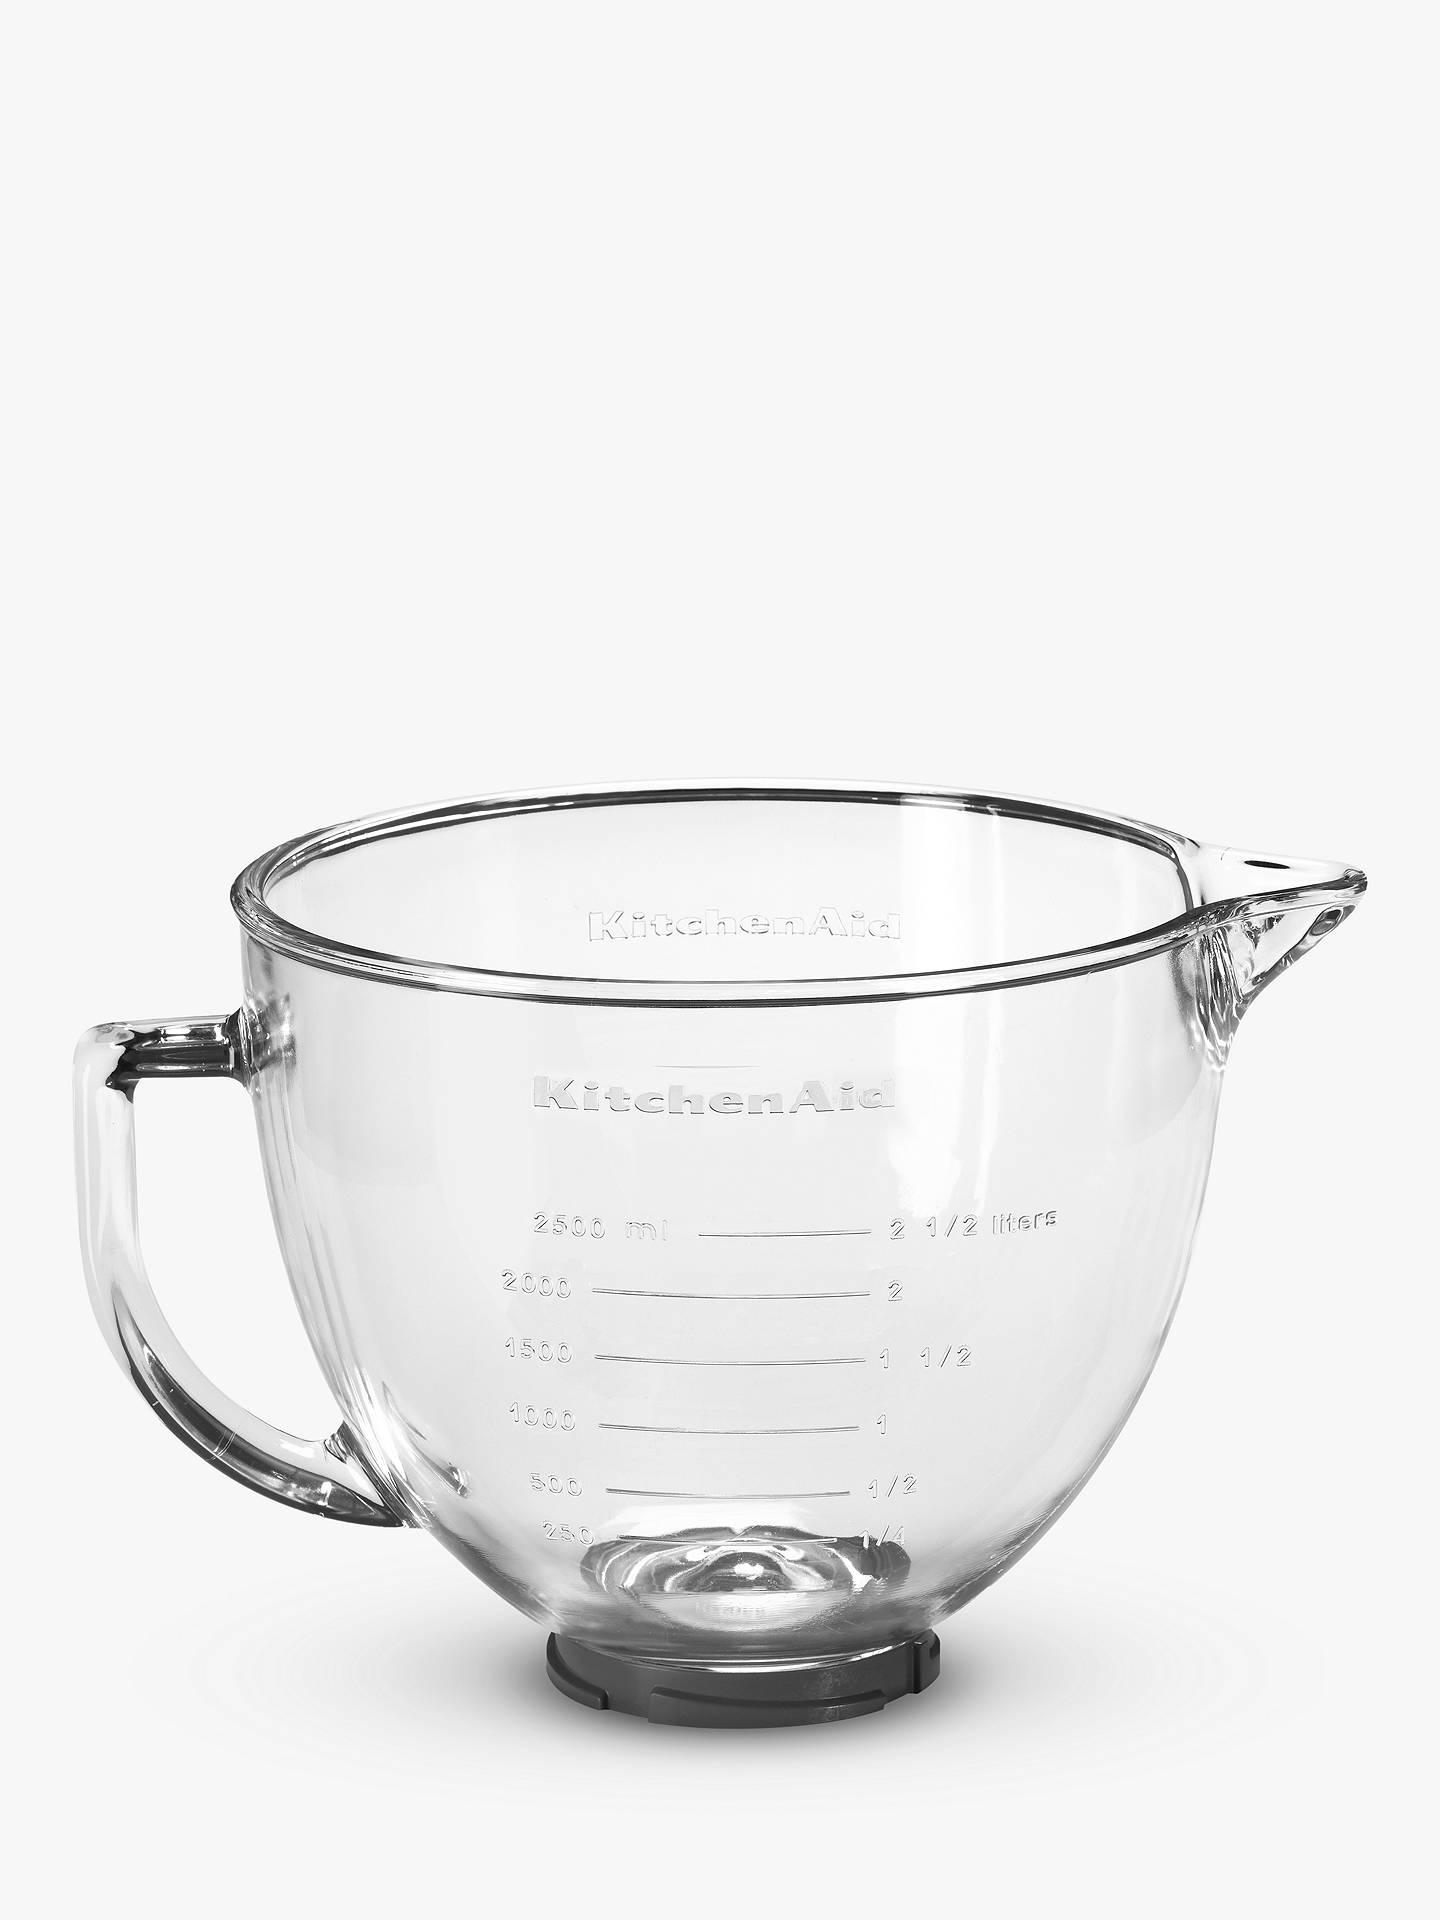 Kitchenaid 4 83l Glass Bowl For Stand Mixer At John Lewis